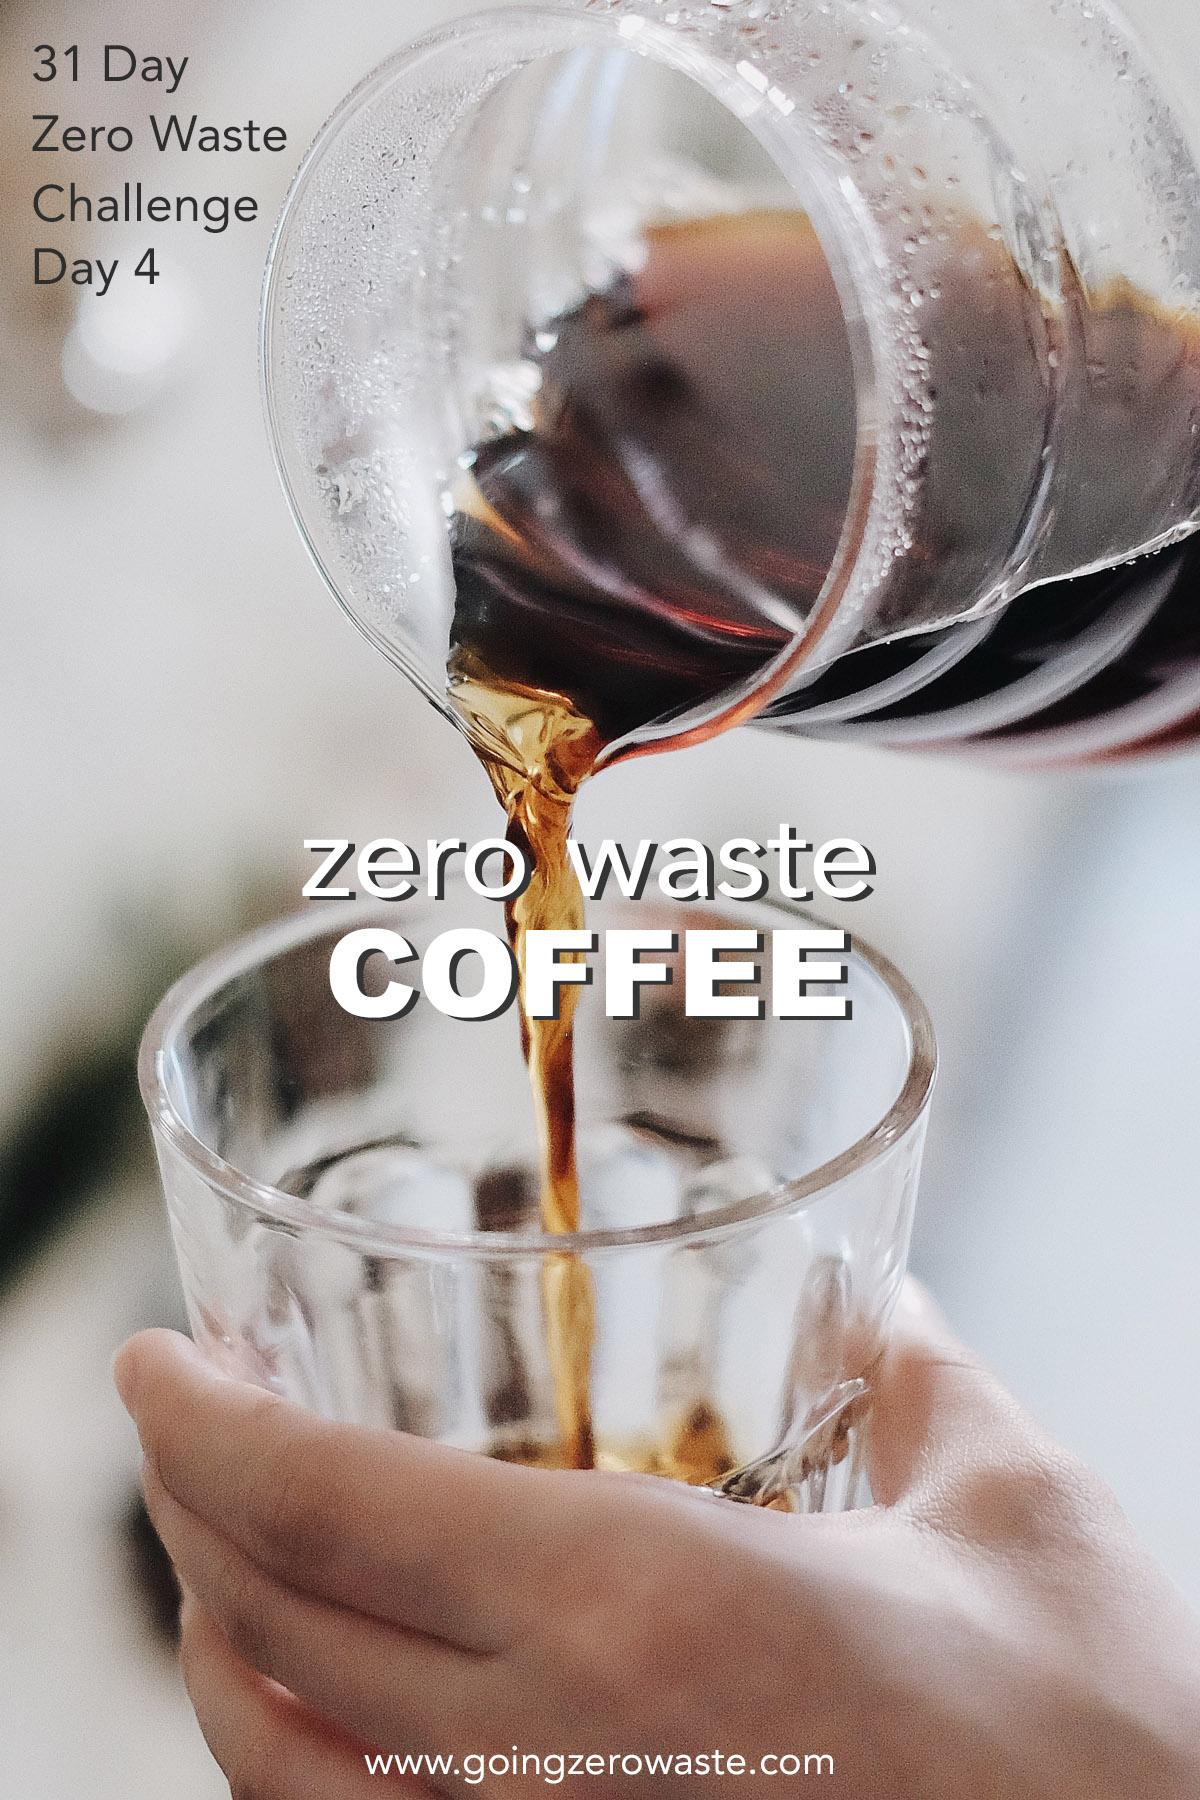 how to make zero waste coffee, day for of the zero waste challenge from www.goingzerowaste.com #ecofriendly #zerowastechallenge #zerowaste #coffee